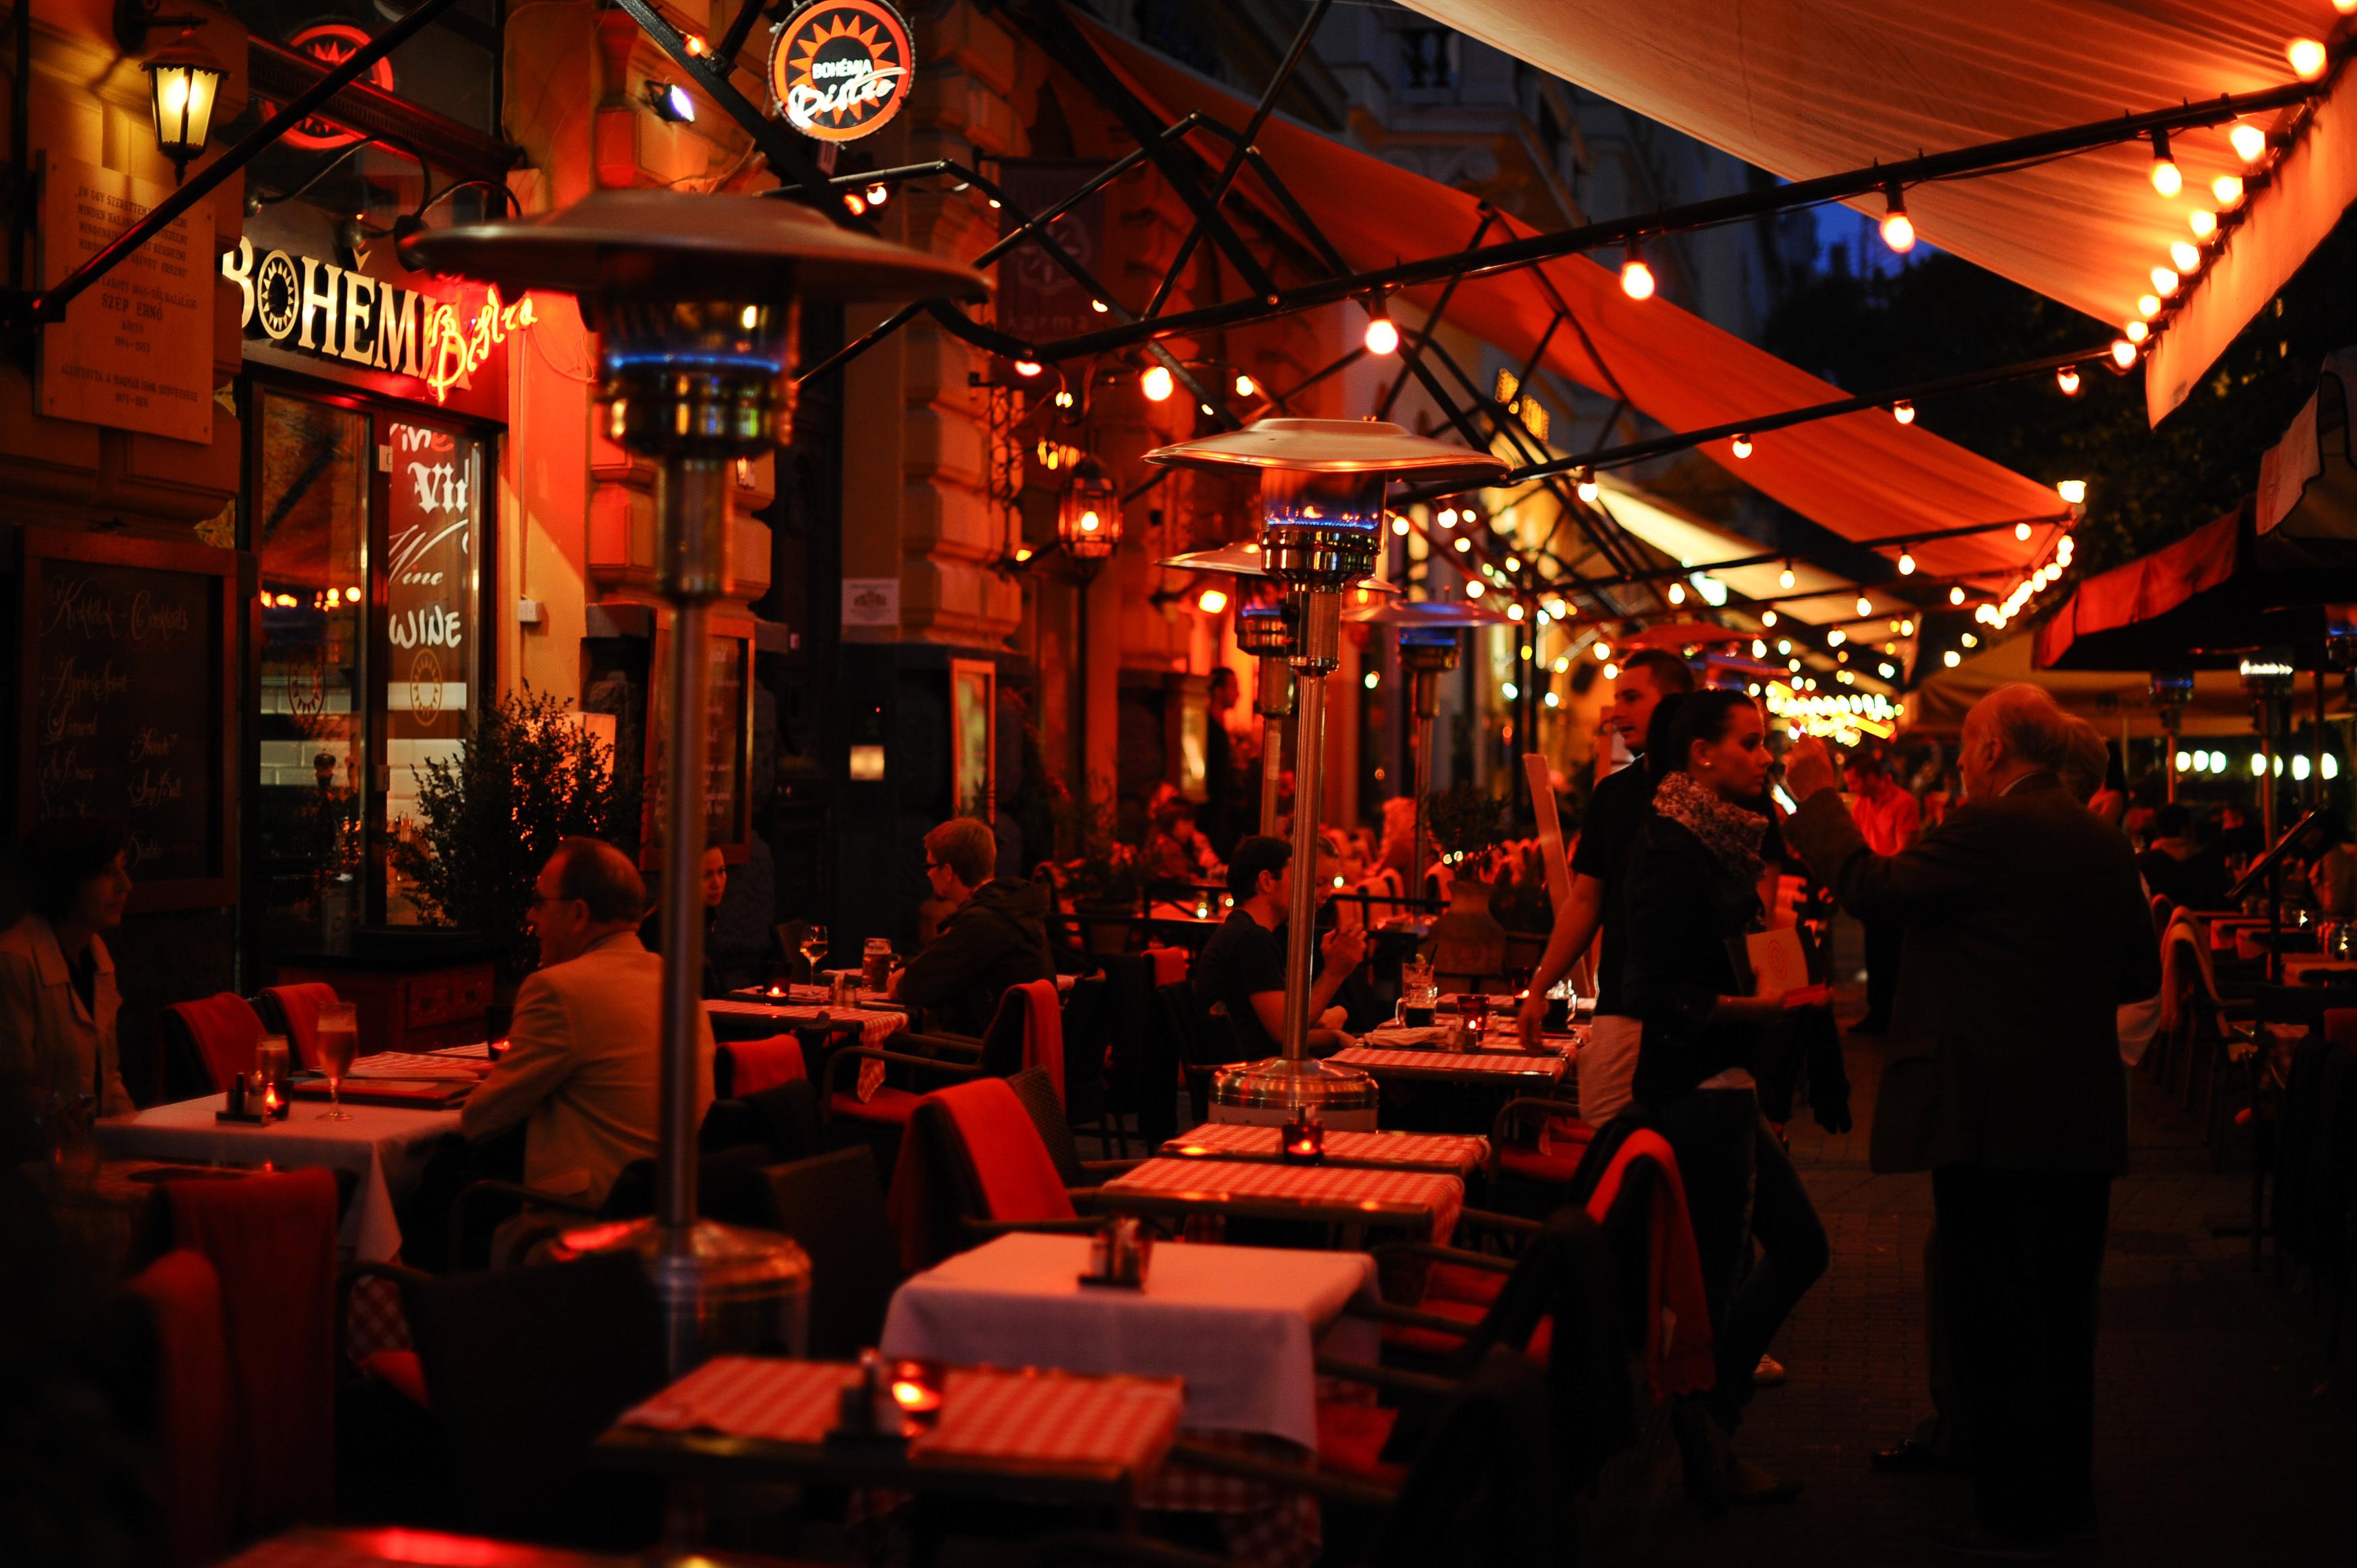 Bohemia Cafe Bar Warrnambool Vic